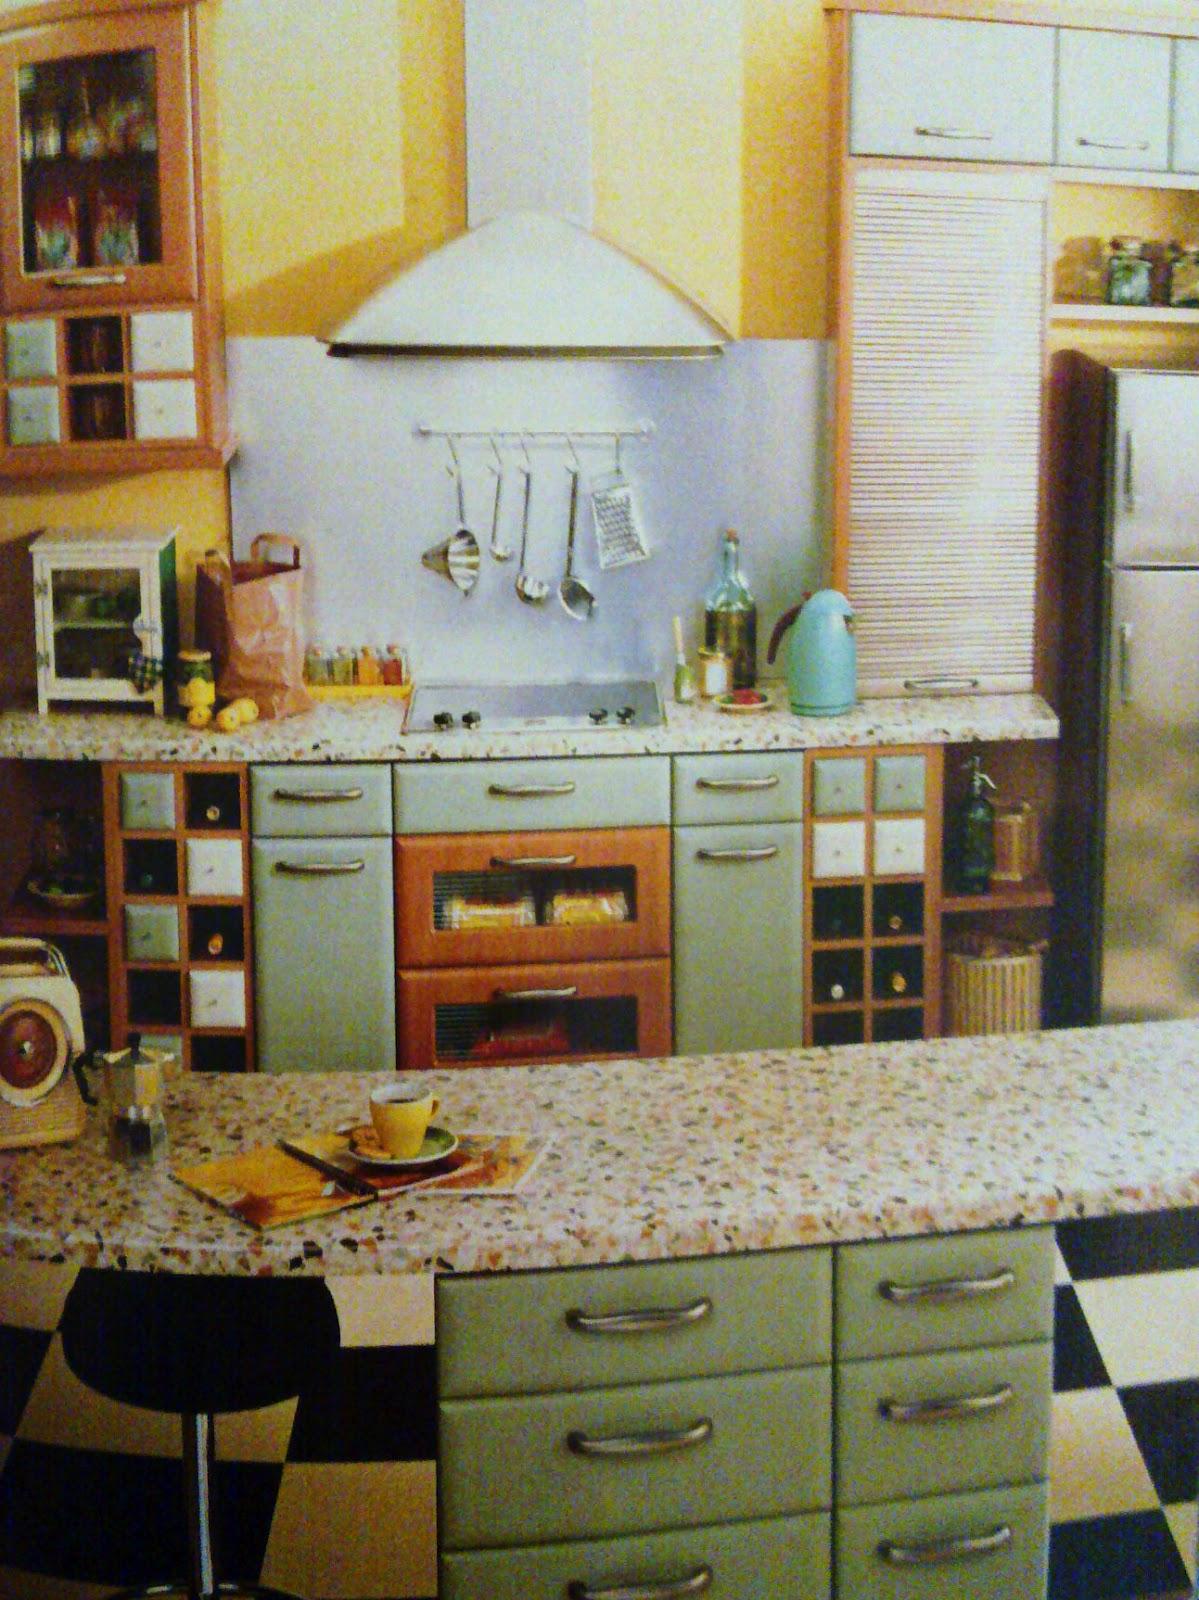 PandyInteriorDesigner: Kitchen of Retro Style - research - Kitchen Table Styles Through The Decades